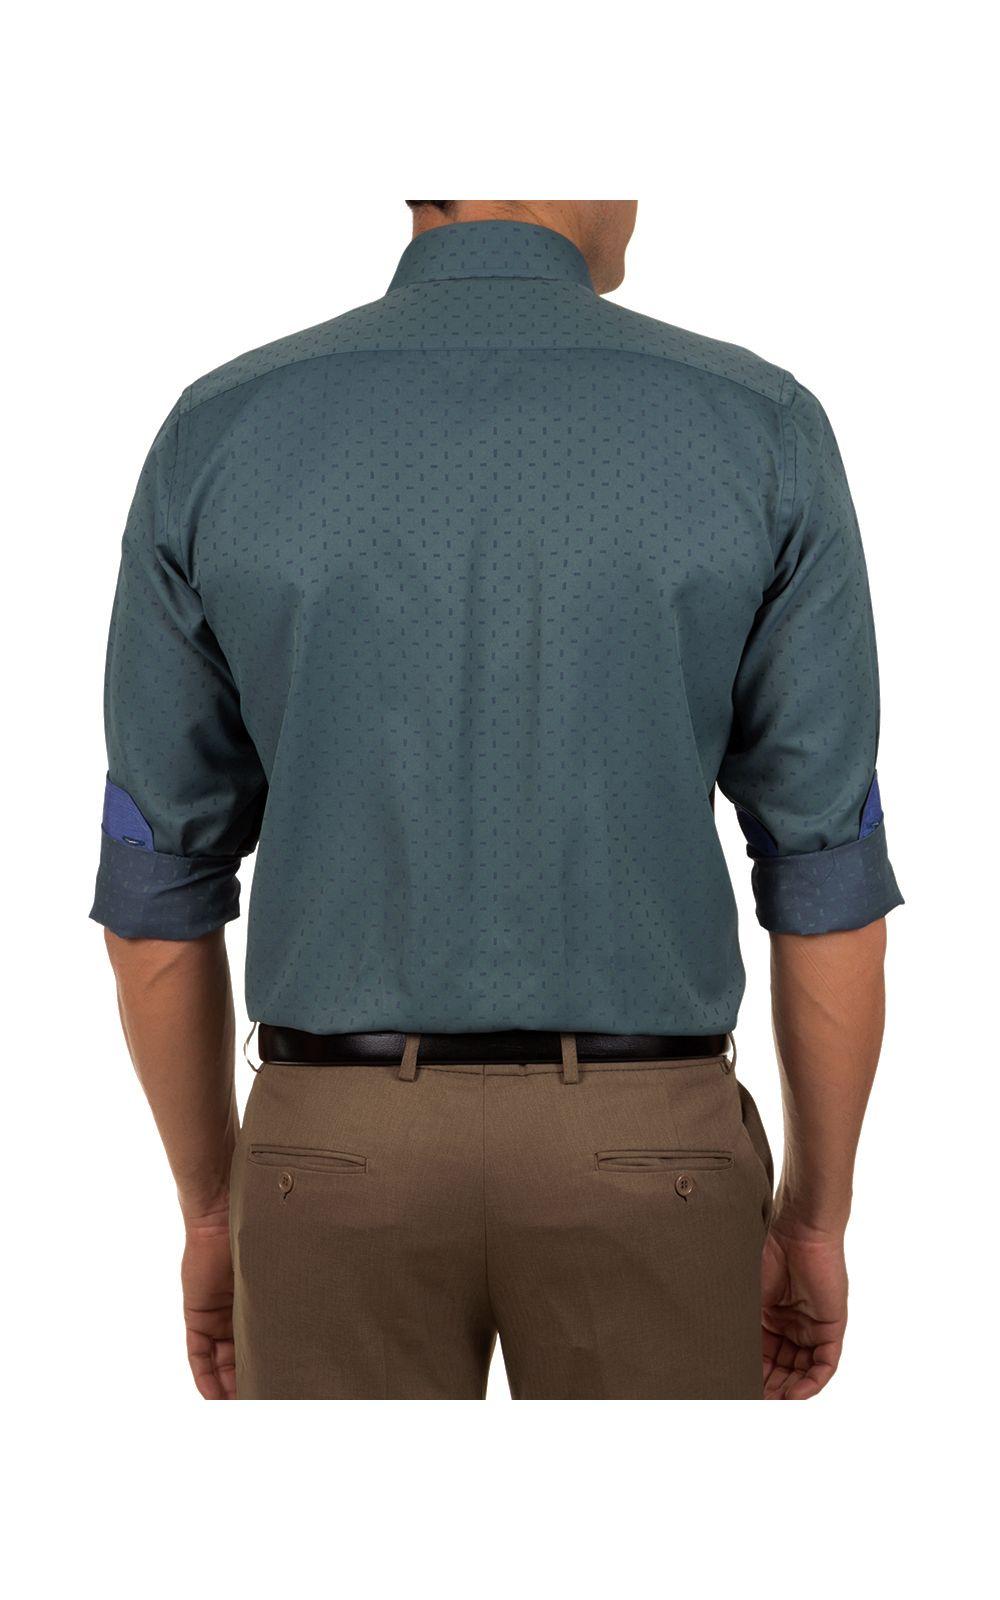 Foto 2 - Camisa Social Masculina Azul Escuro Detalhada